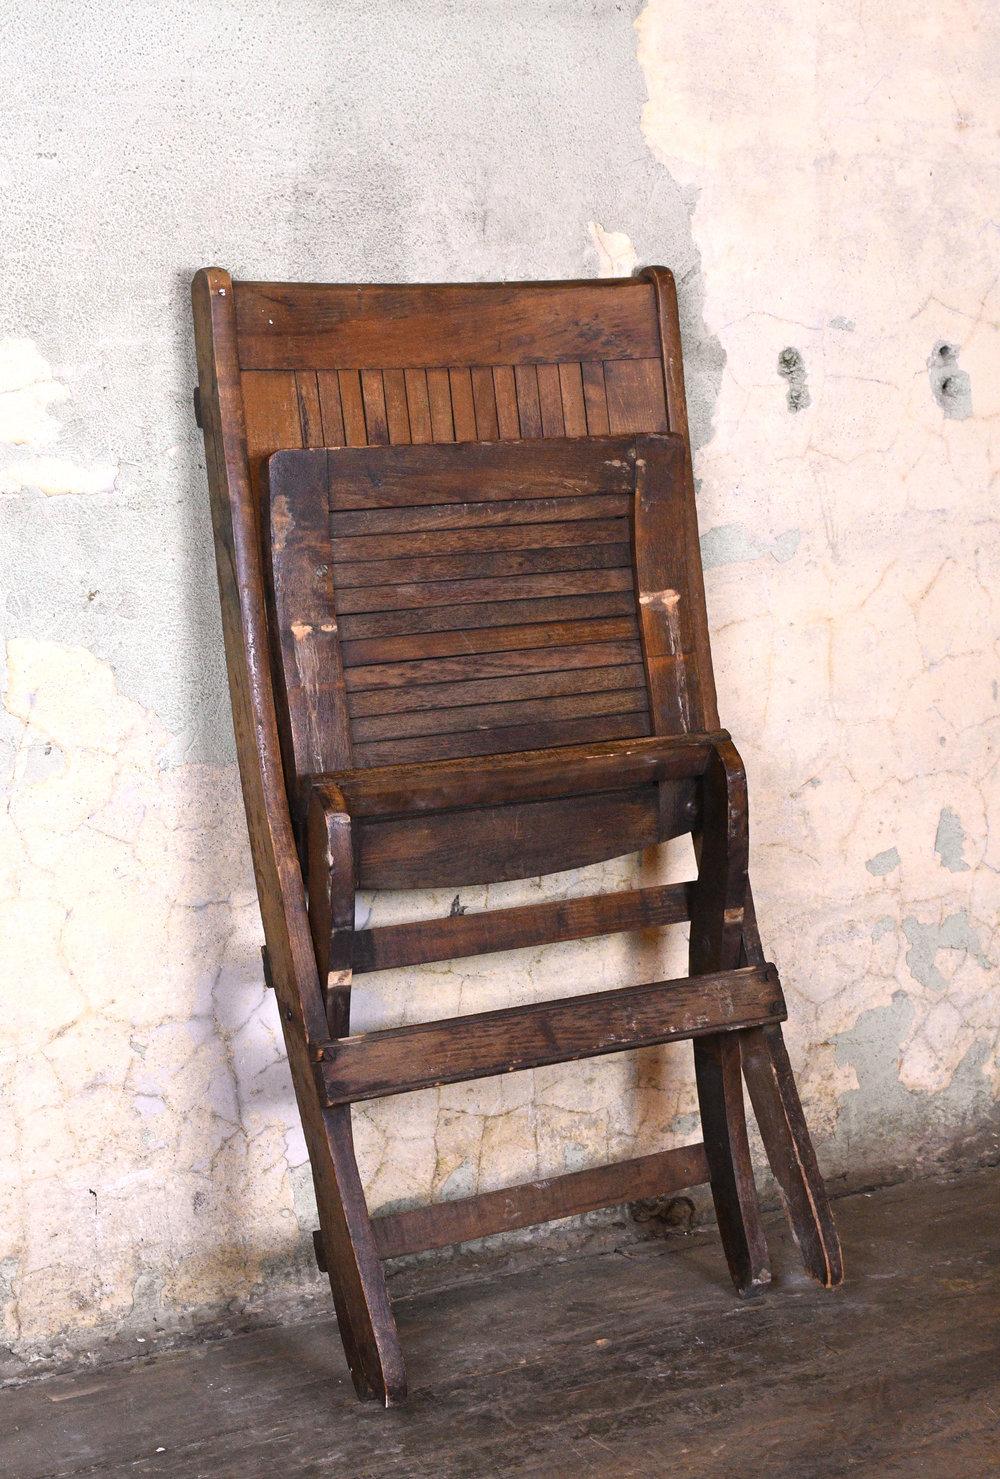 47681-A-wood-slat-folding-chair-all-folded-up.jpg